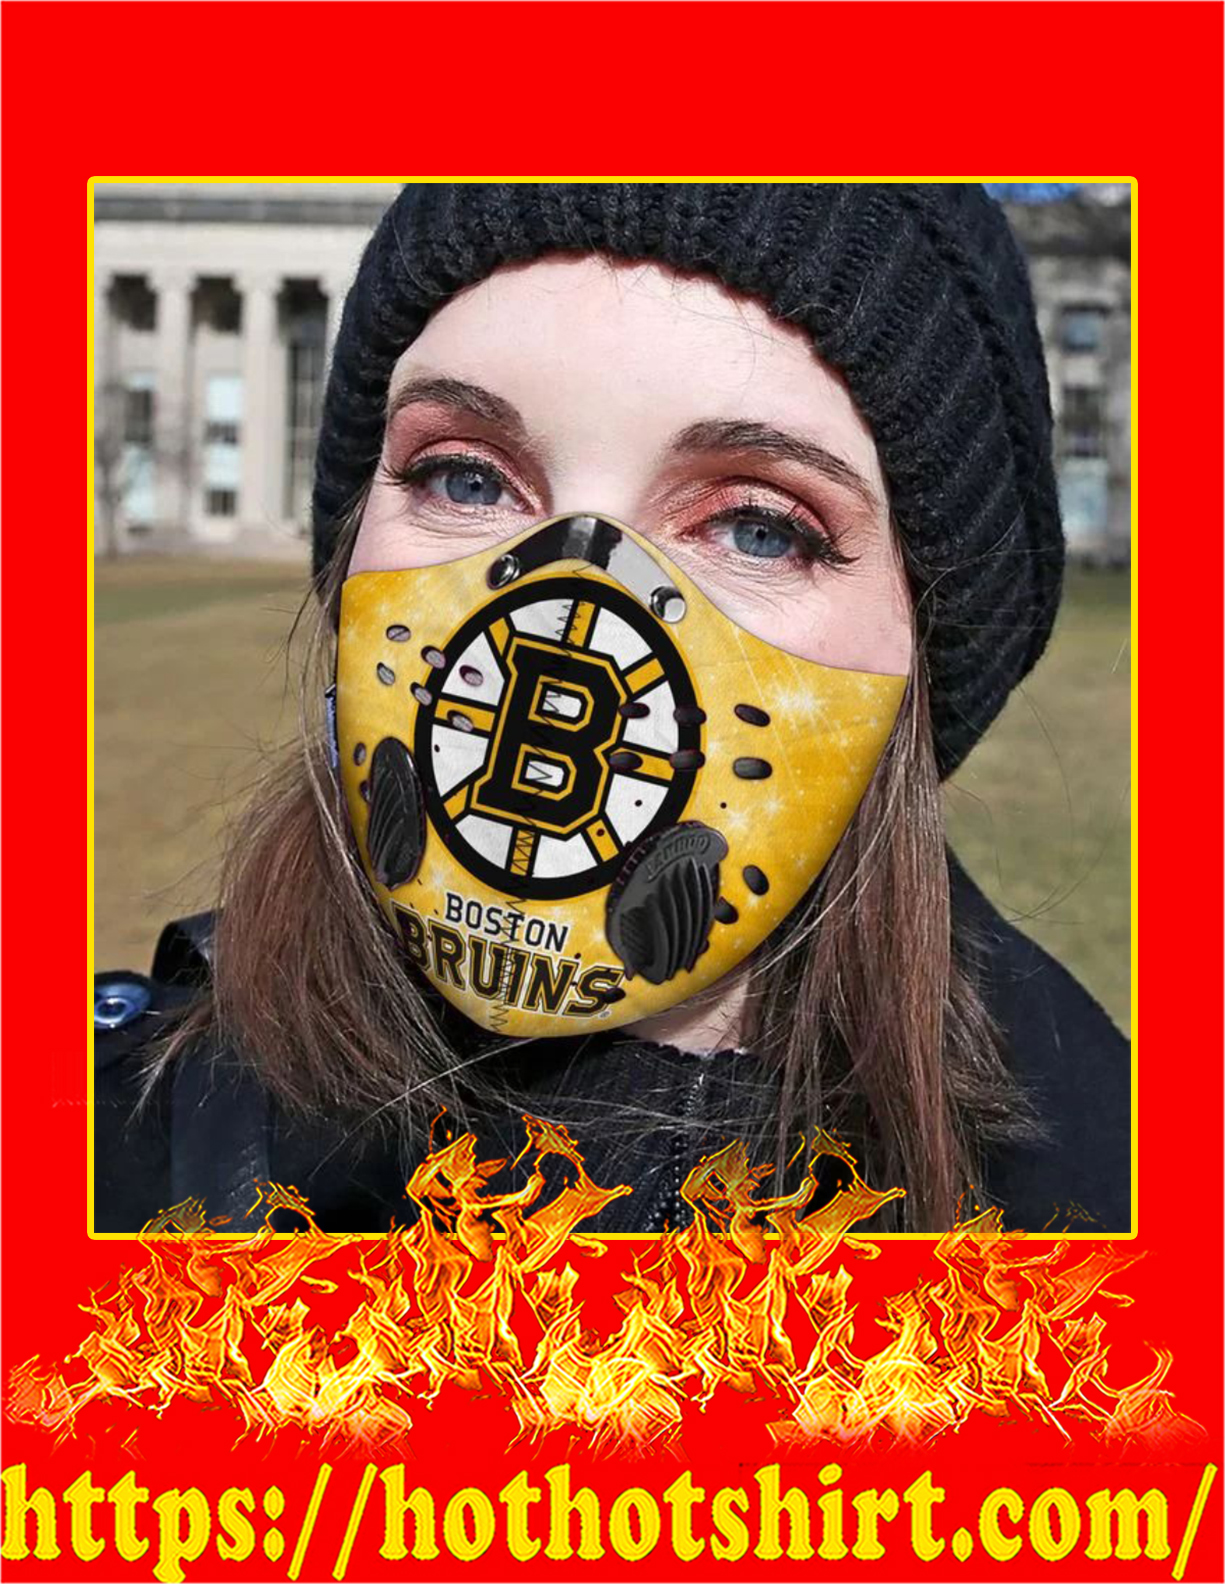 Boston bruins filter face mask - Pic 2